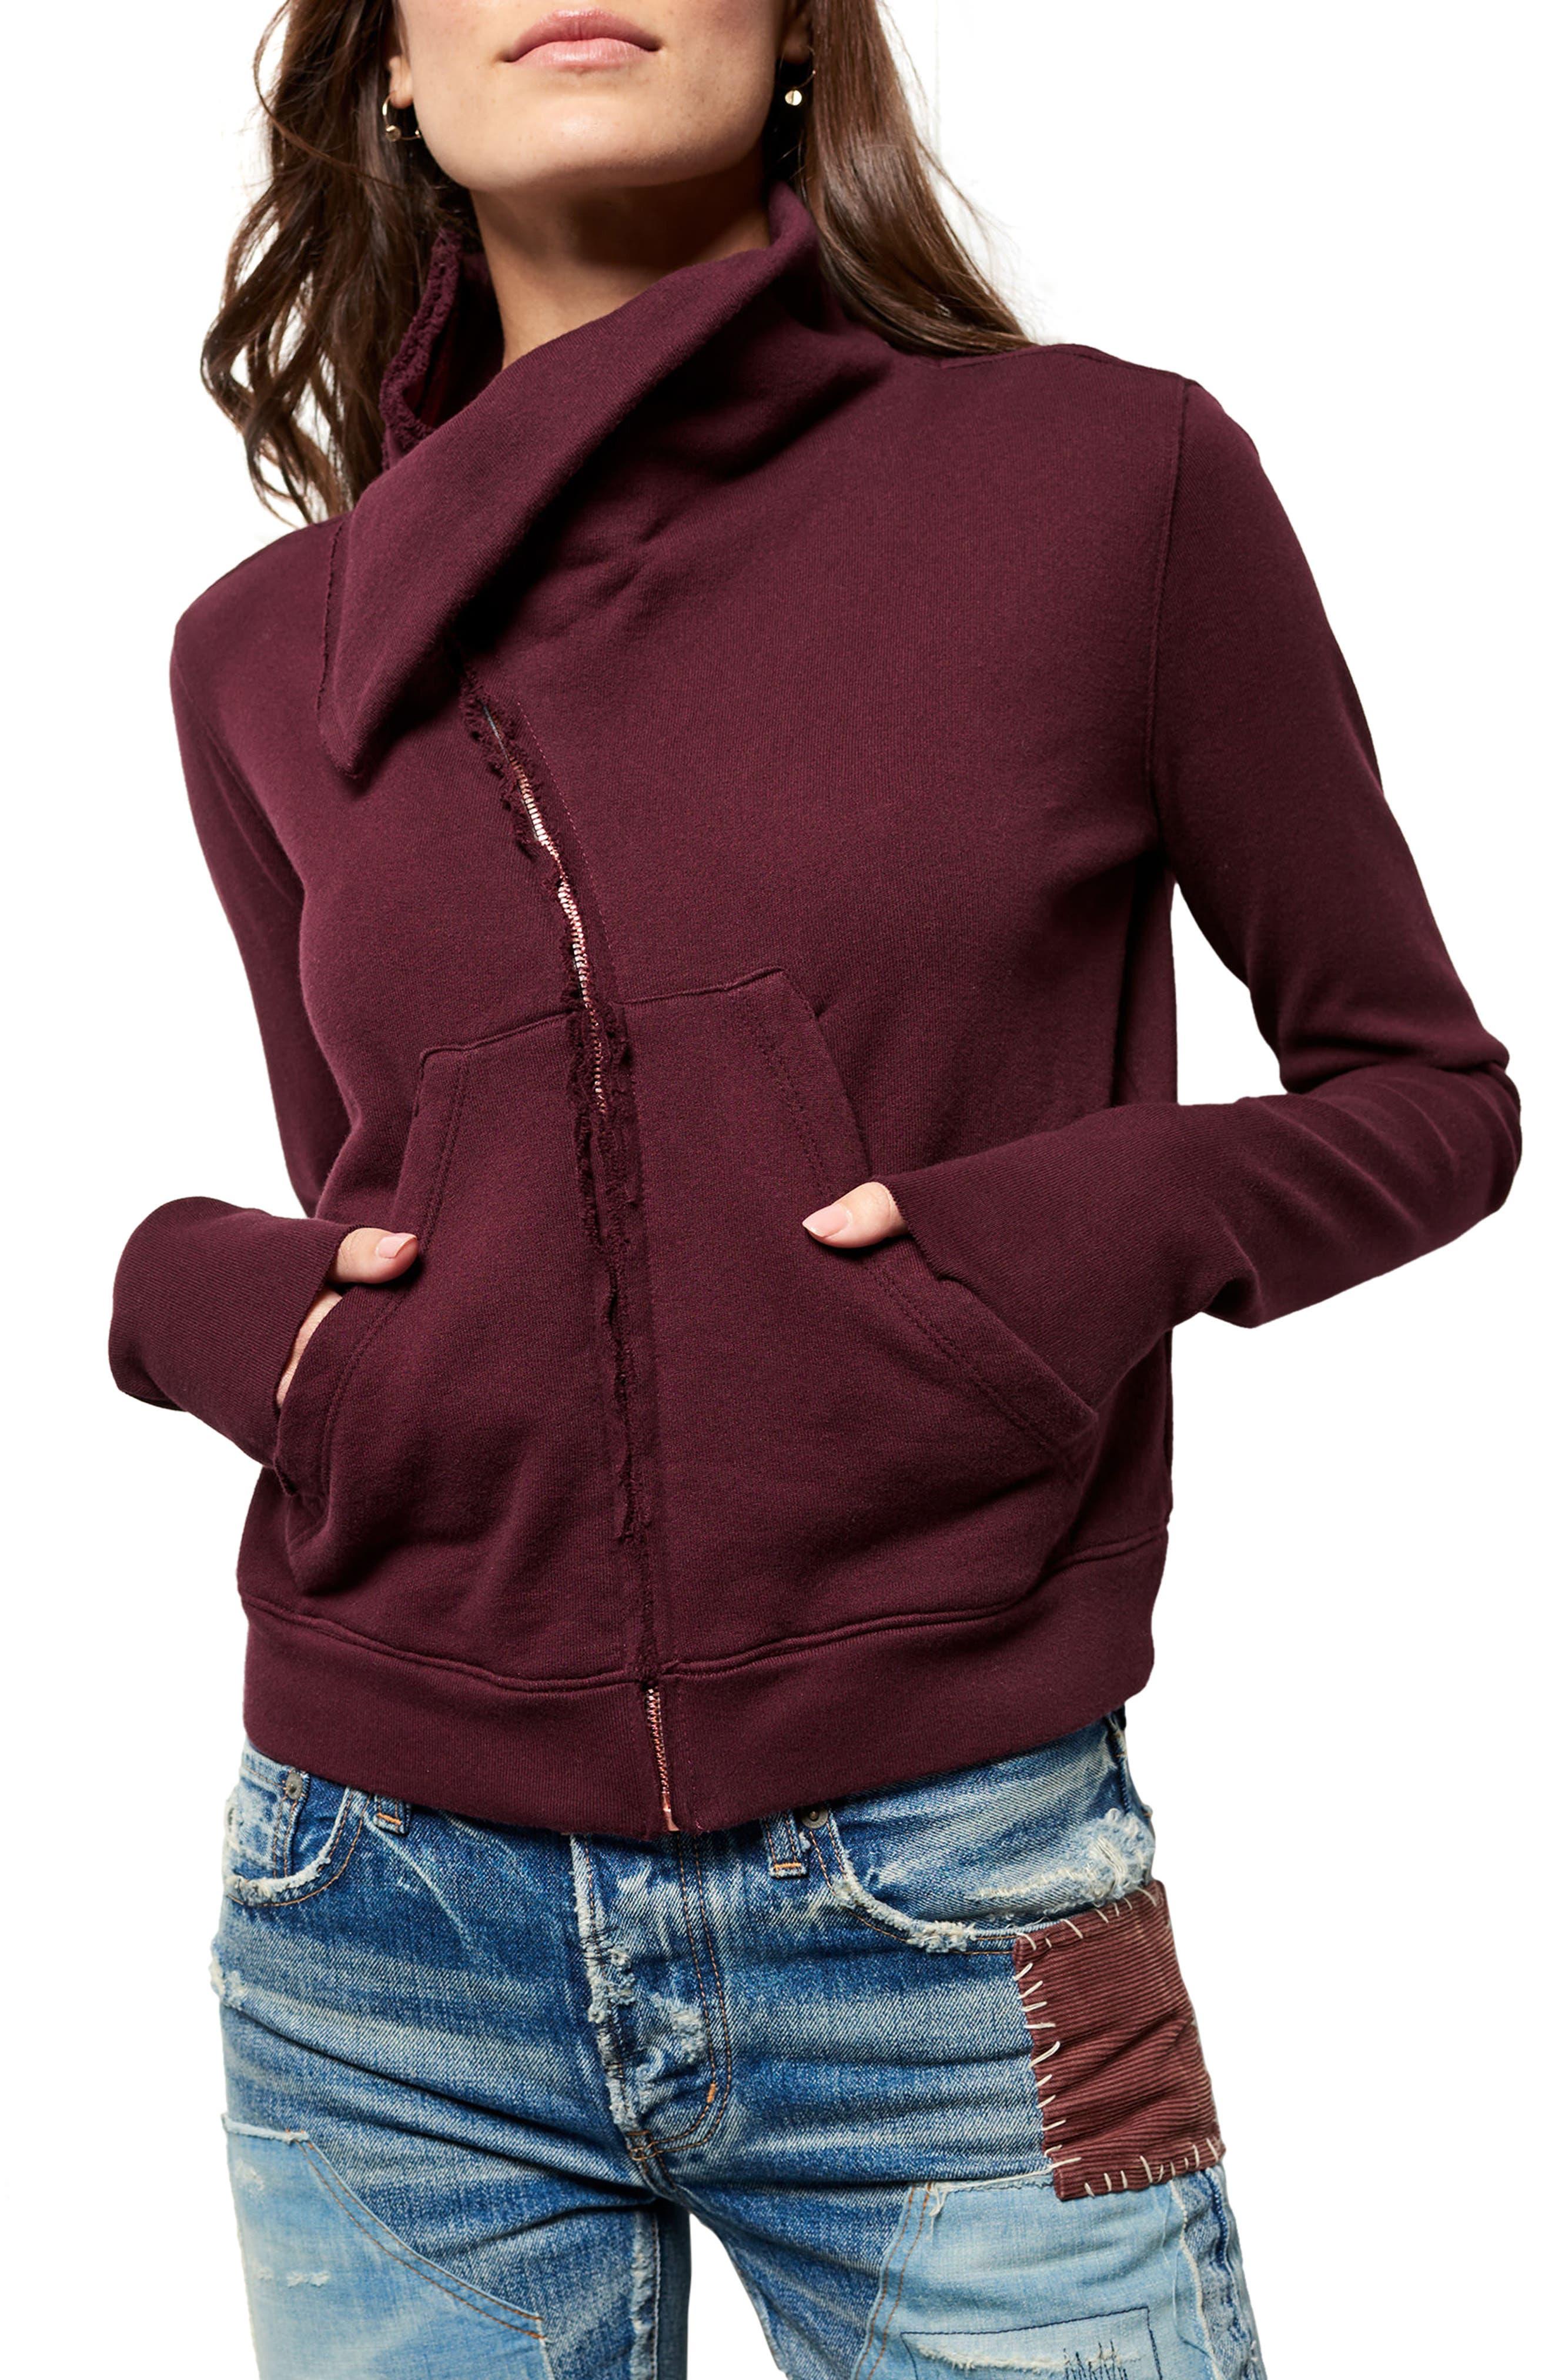 Zip Fleece Jacket,                             Main thumbnail 1, color,                             932